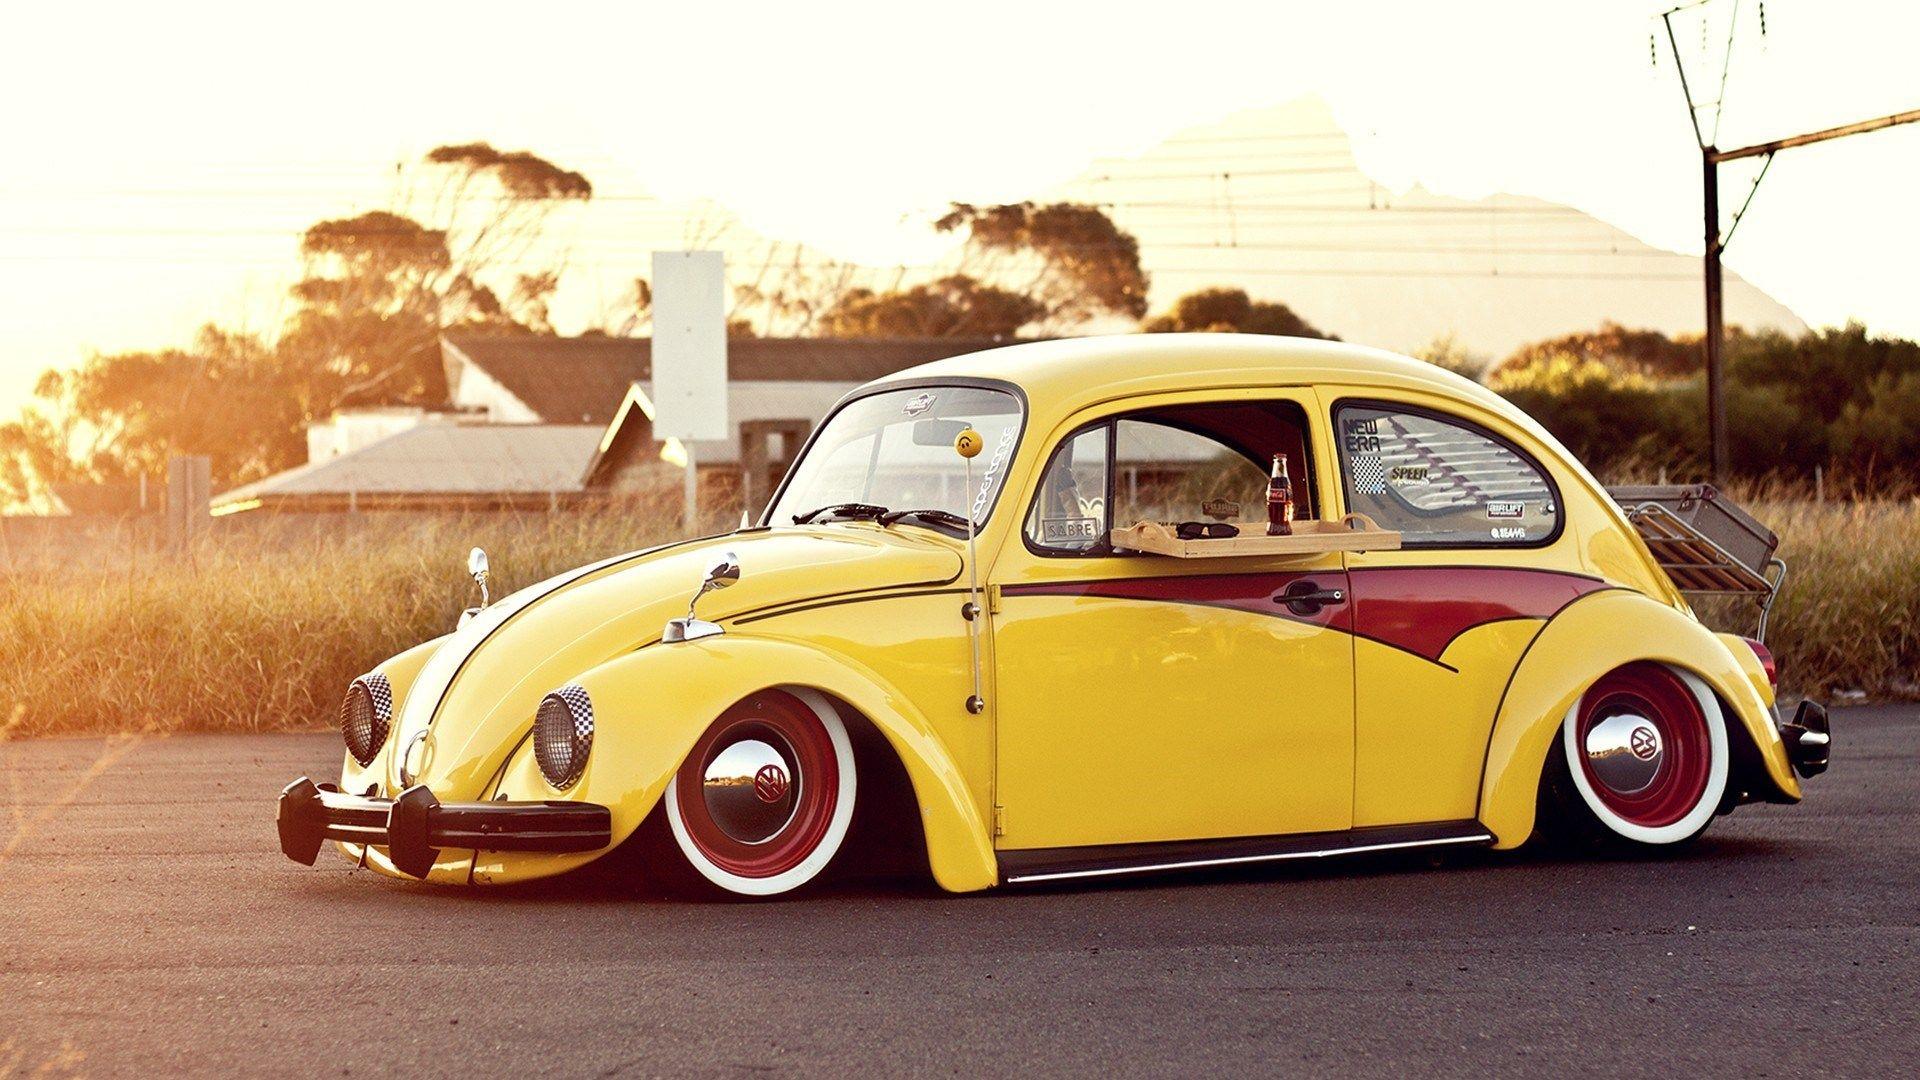 Wooden Tray Cola Meal Volkswagen Bug Beetle Classic Hd Wallpaper